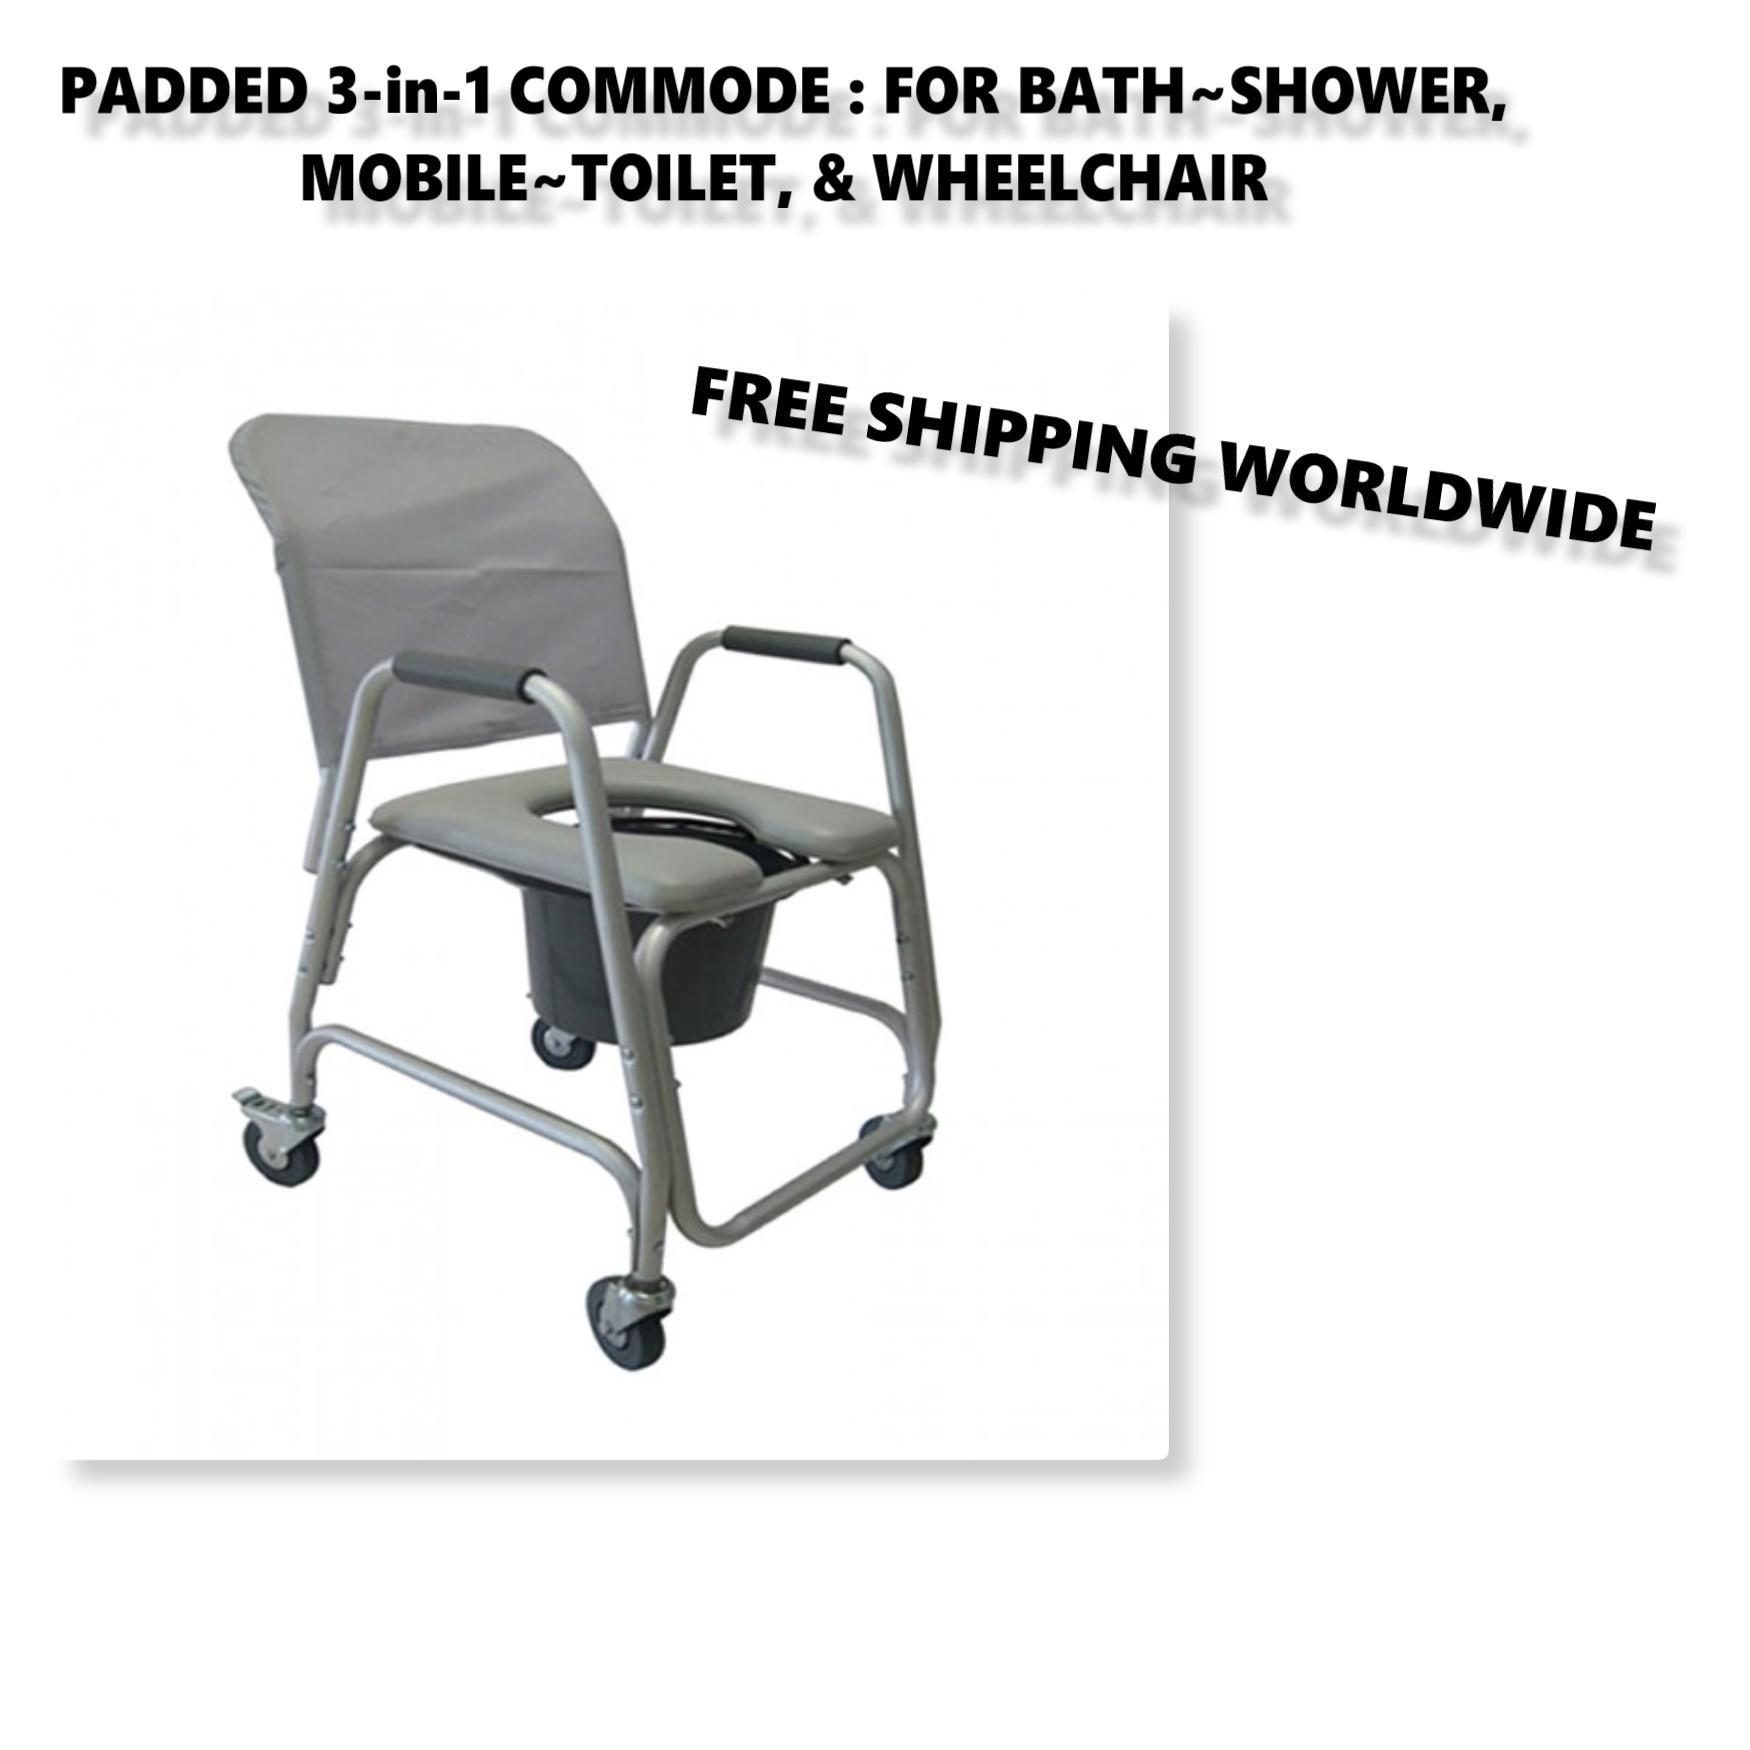 TECHNOMEDIC PADDED Wheelchair for sale | Bimedis (ID929441)